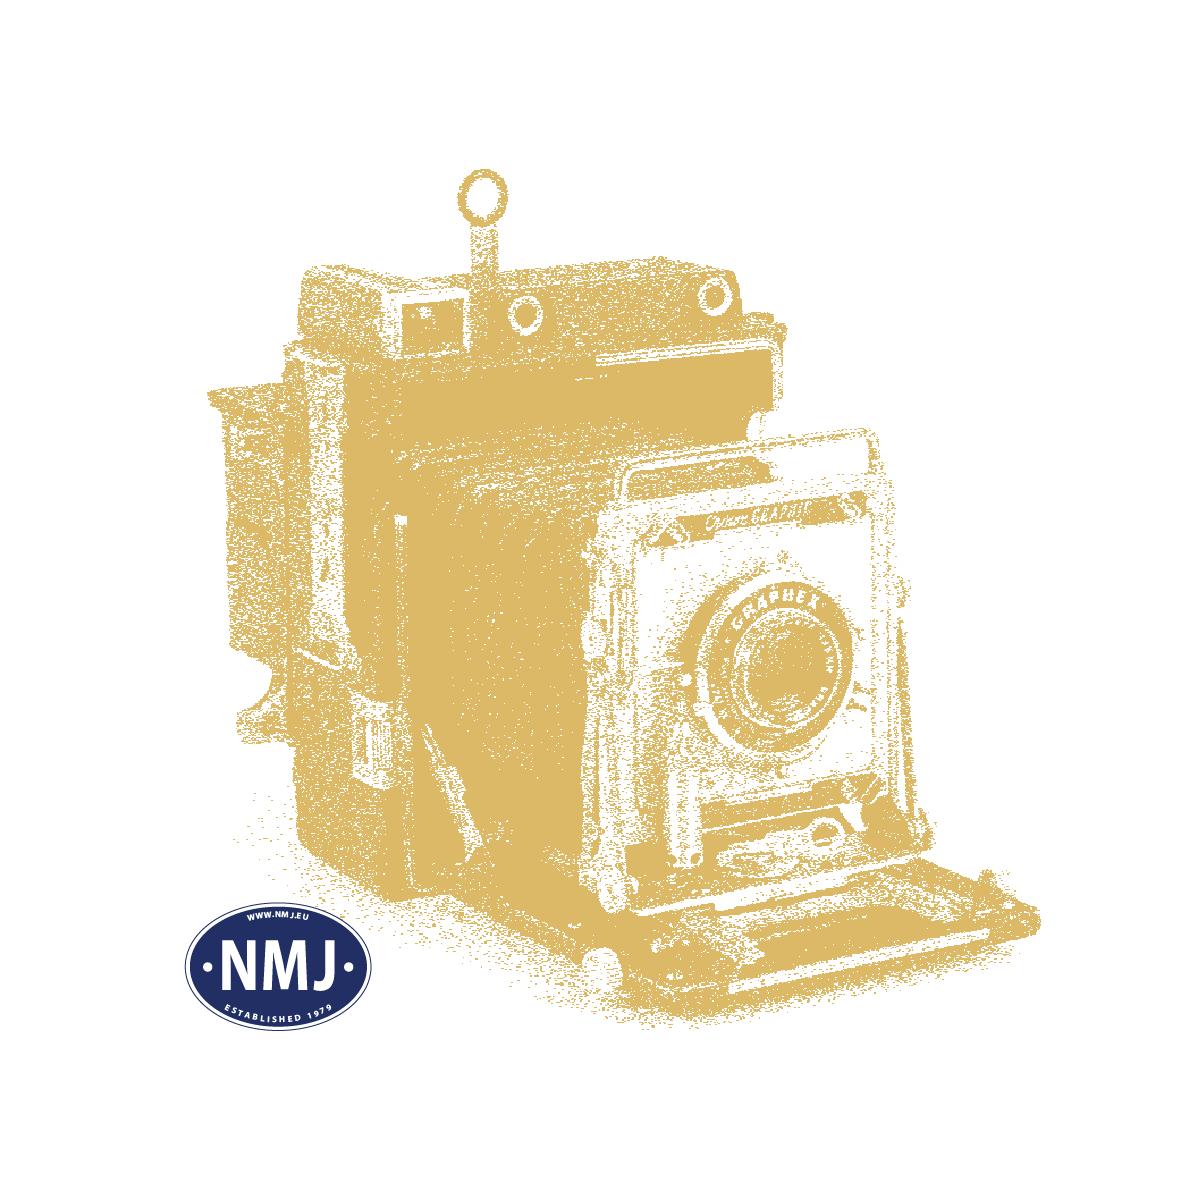 NMJT505.991 - NMJ Topline NSB/Finsam fliscontainer, 1 stk